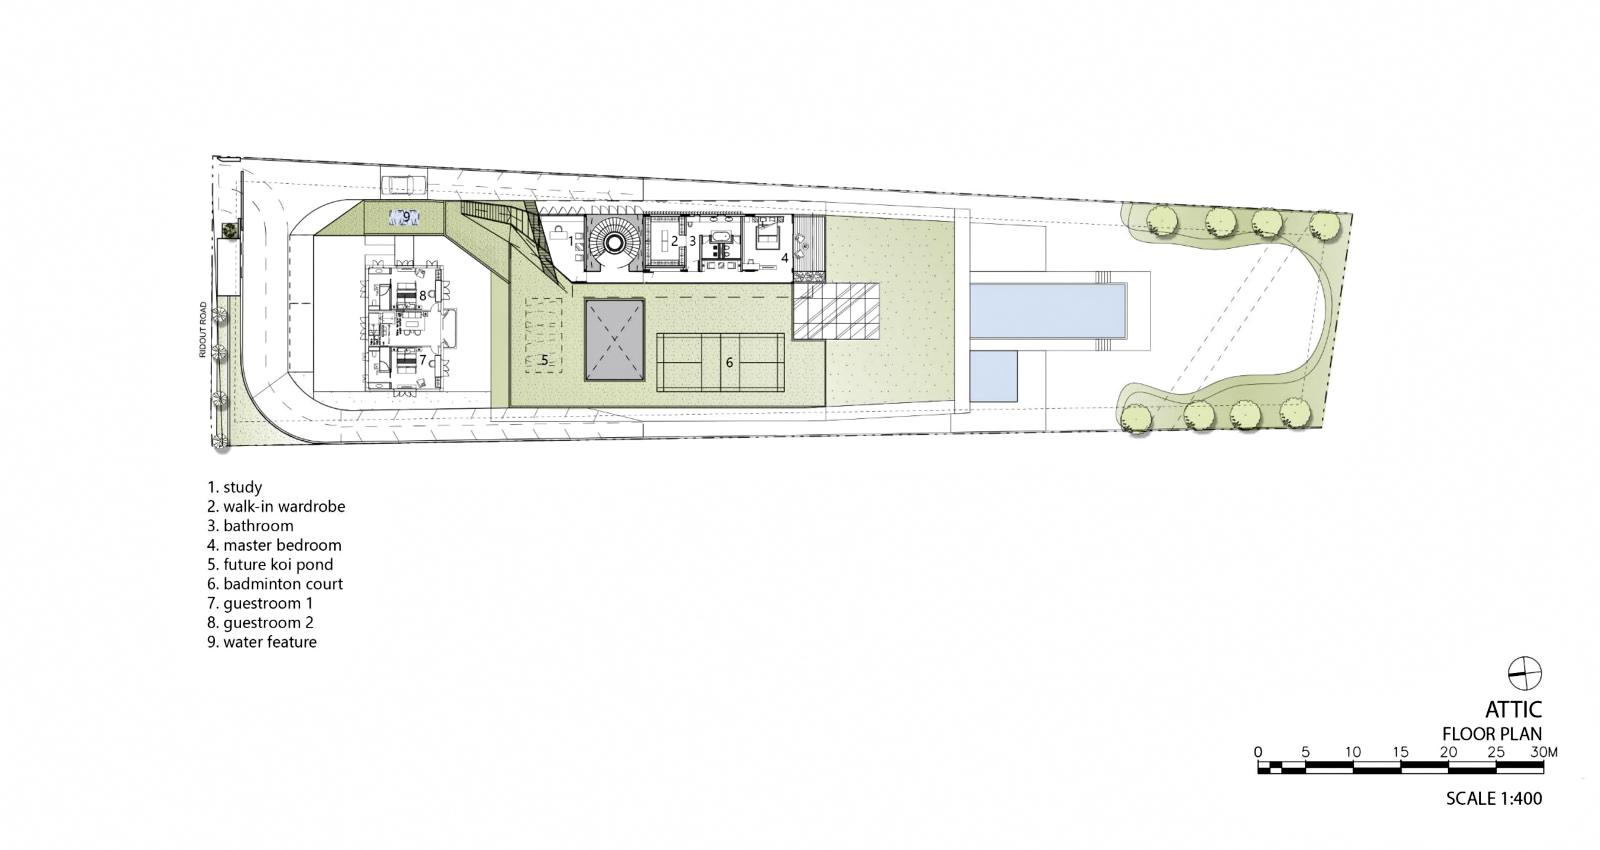 Attic Floor Plan - Hidden House Luxury Estate - Ridout Road, Singapore